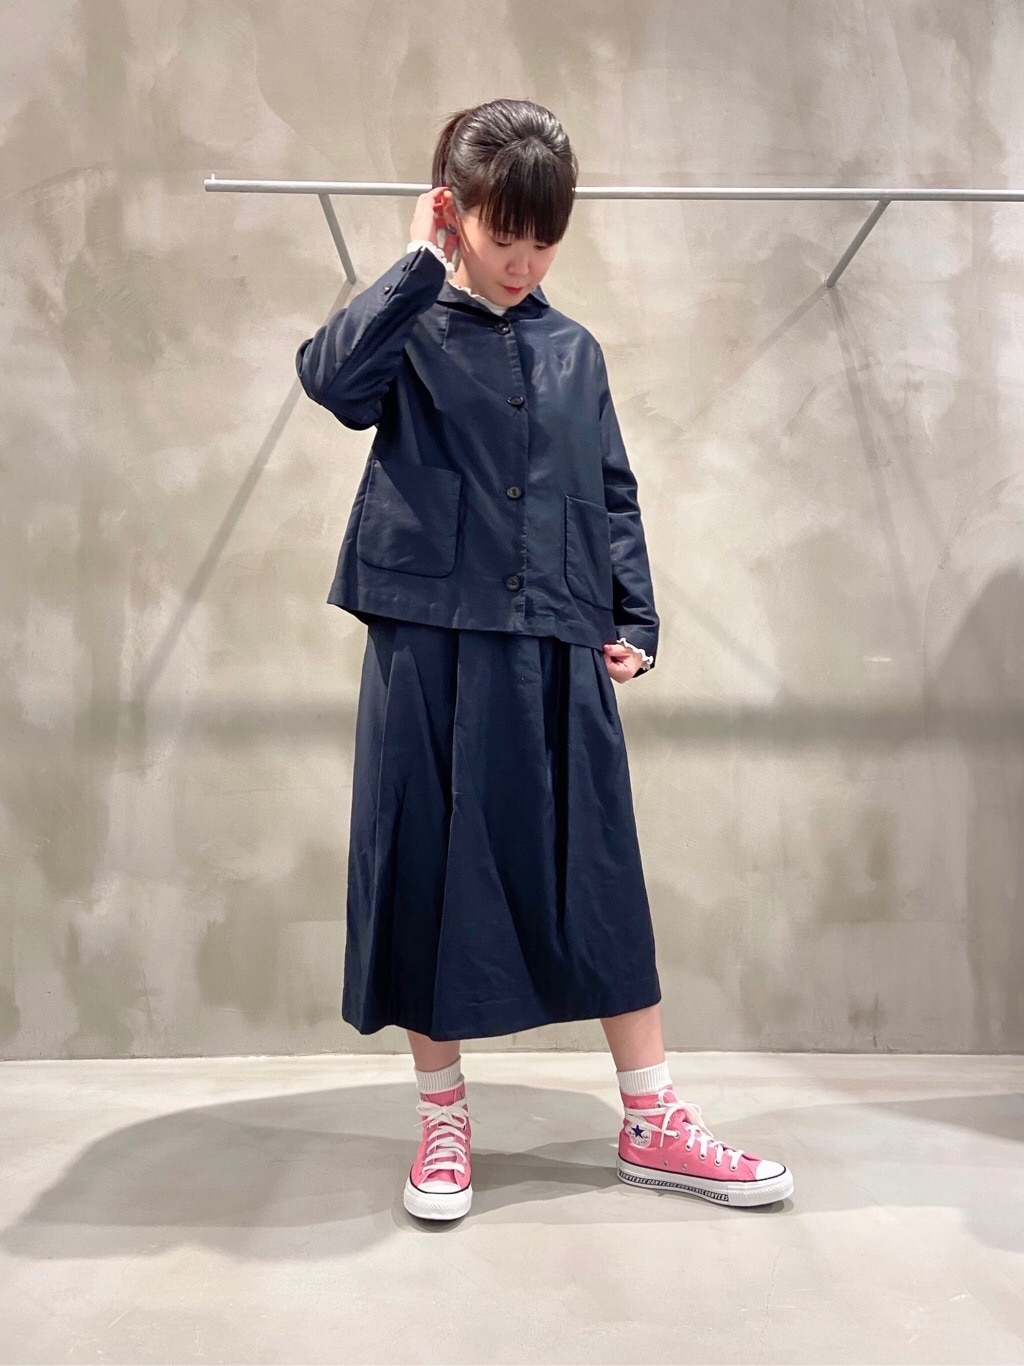 bulle de savon 渋谷スクランブルスクエア 身長:158cm 2020.09.16